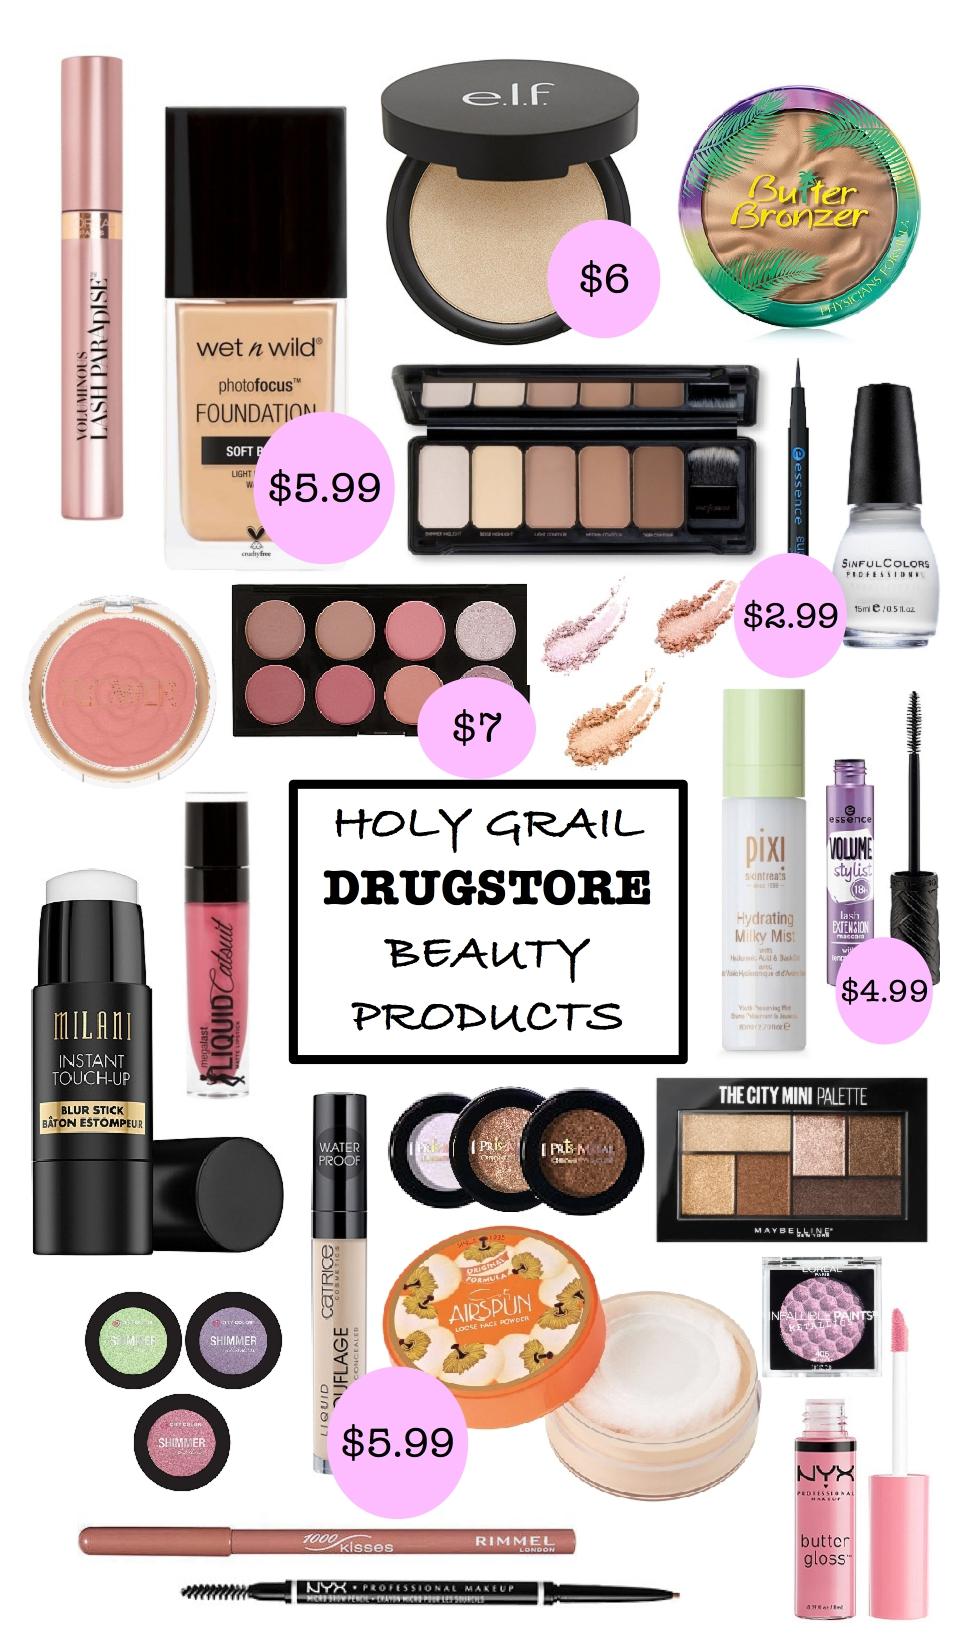 best drugstore makeup, best under 10 makeup, best makeup dupes, shape tape dupe, best of beauty, holy grail drugstore makeup